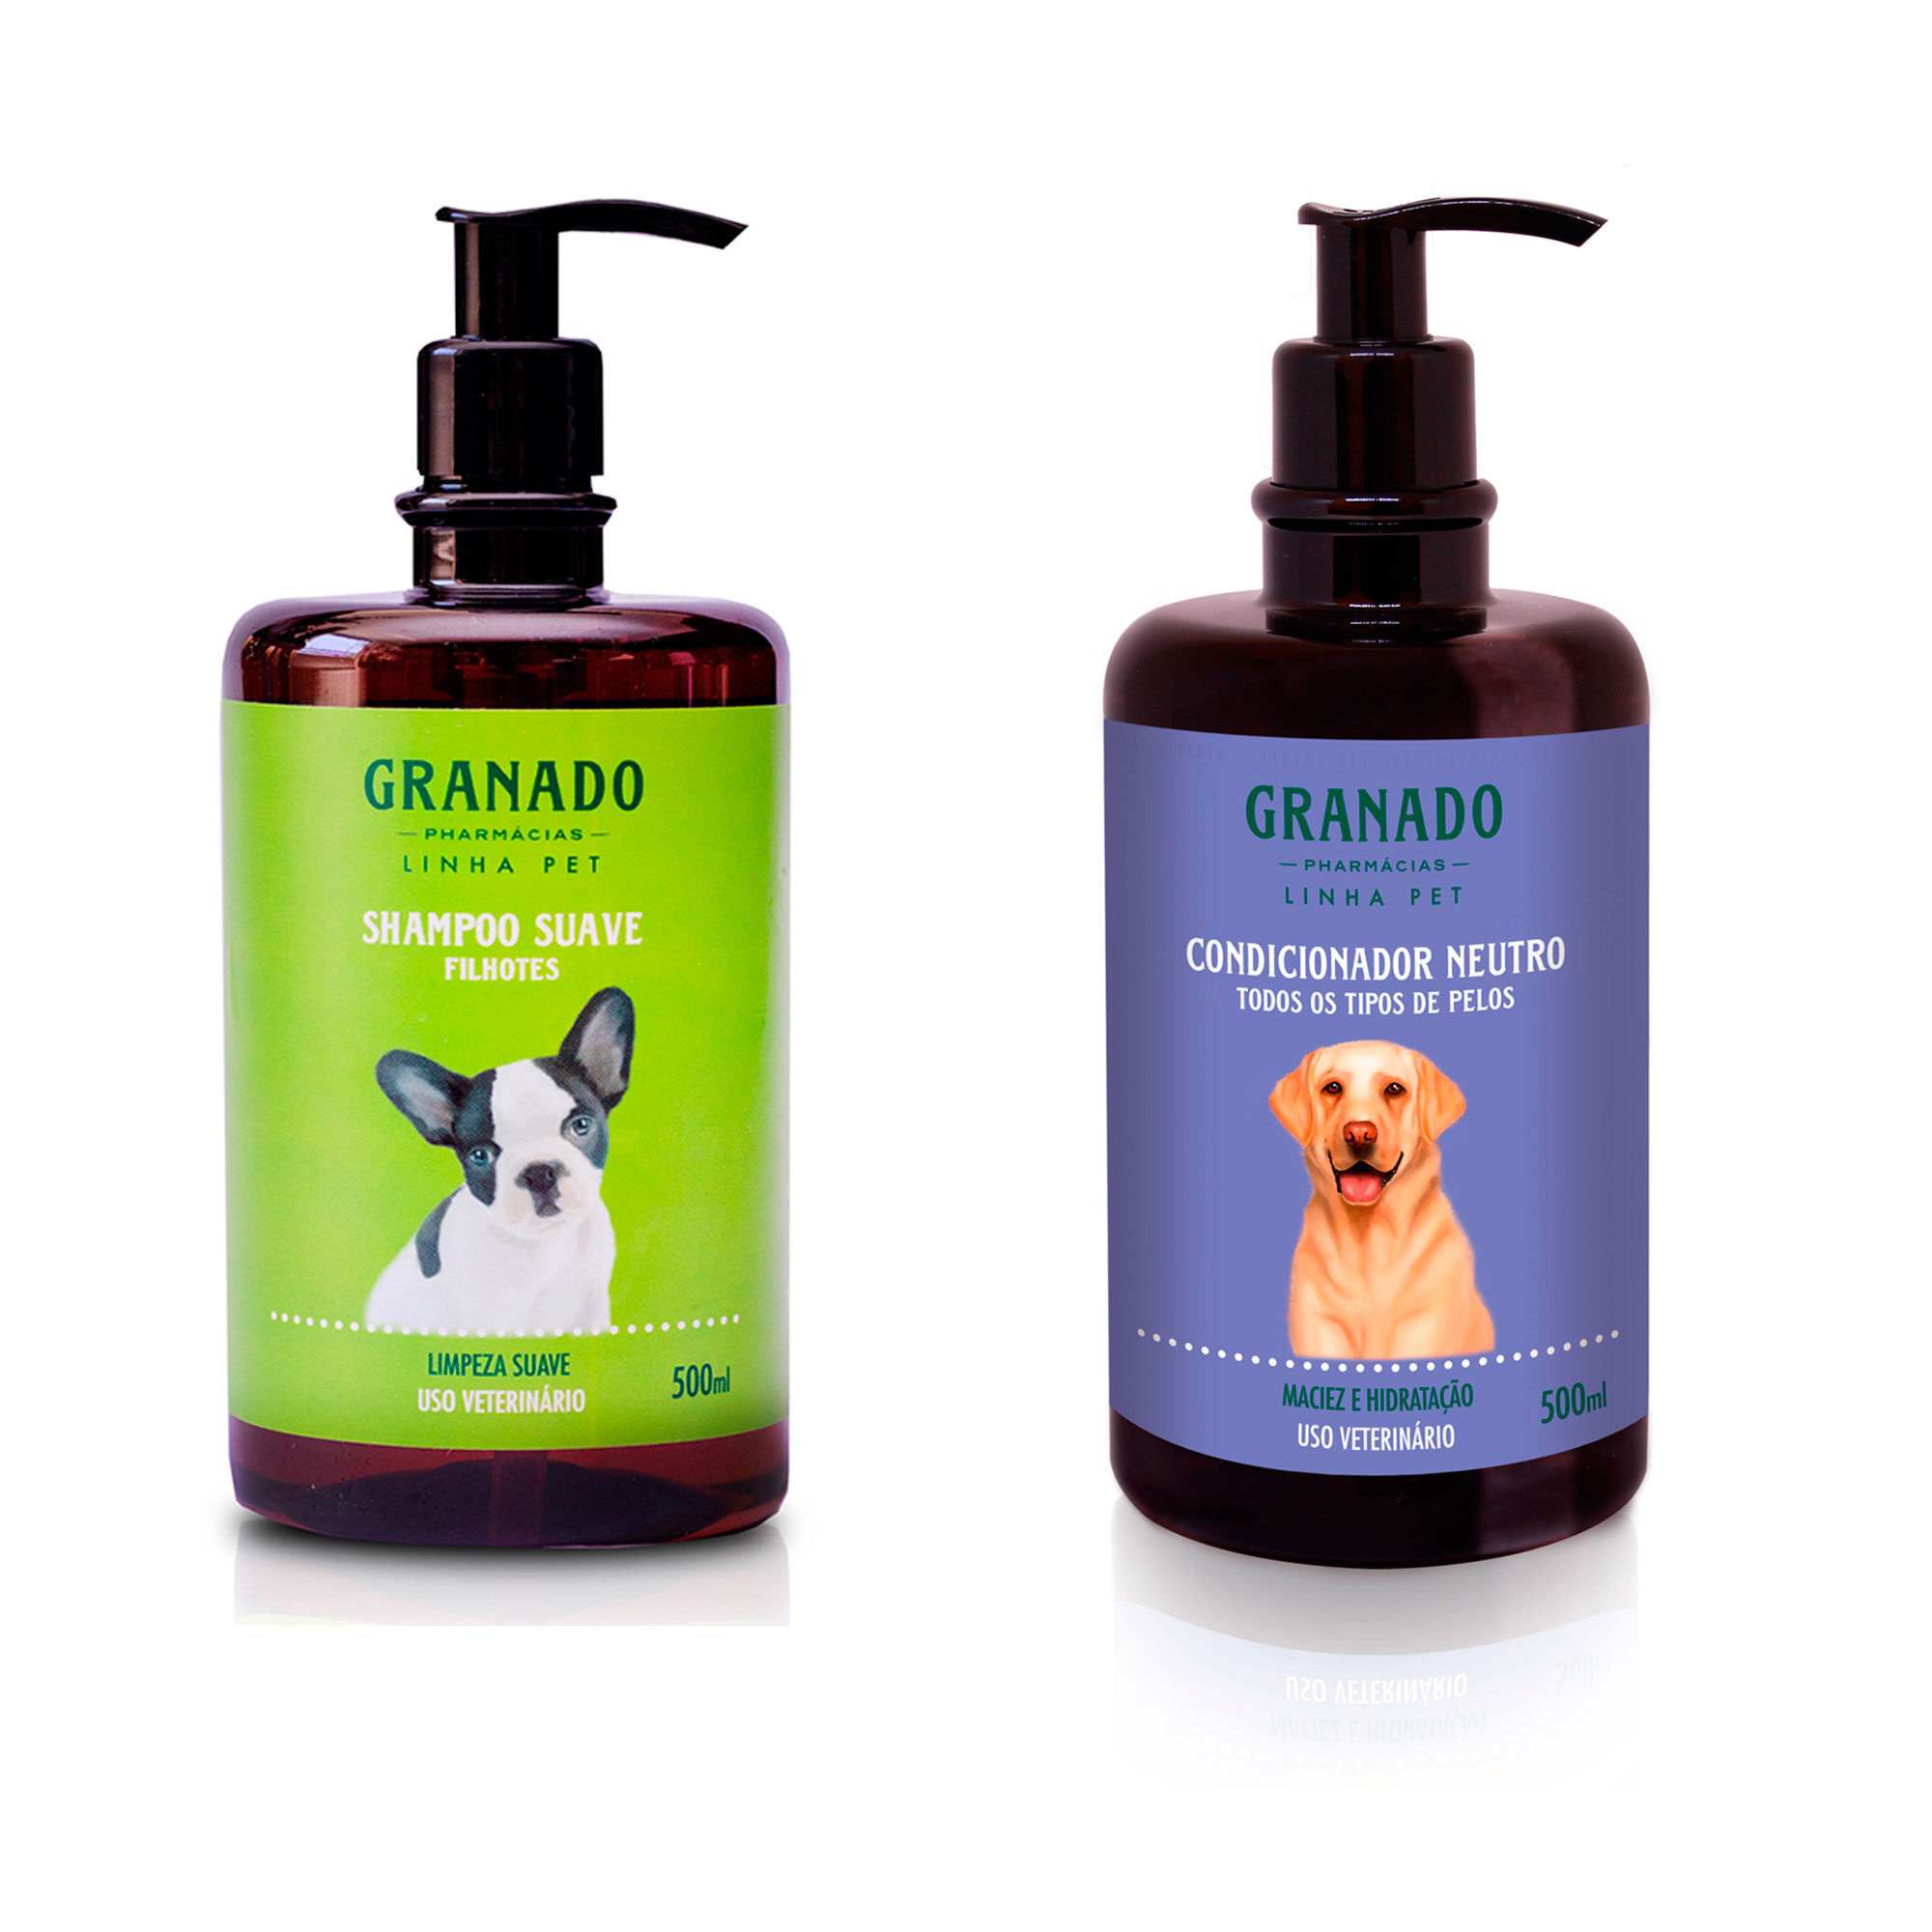 Kit Shampoo Filhote e Condicionador Neutro 500ml Granado Pet